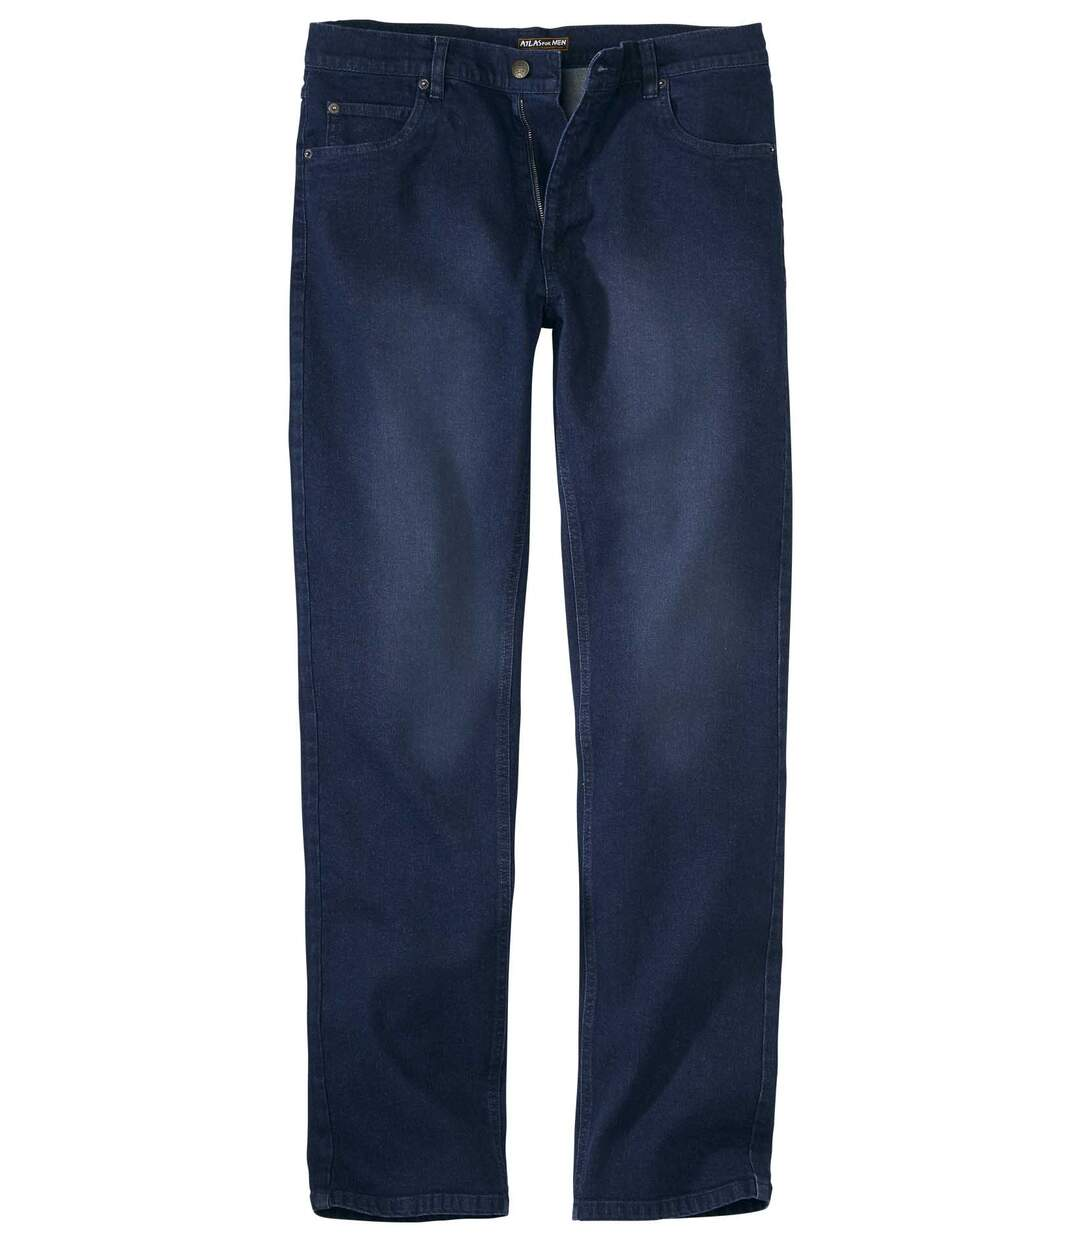 Wygodne jeansy Regular ze stretchem